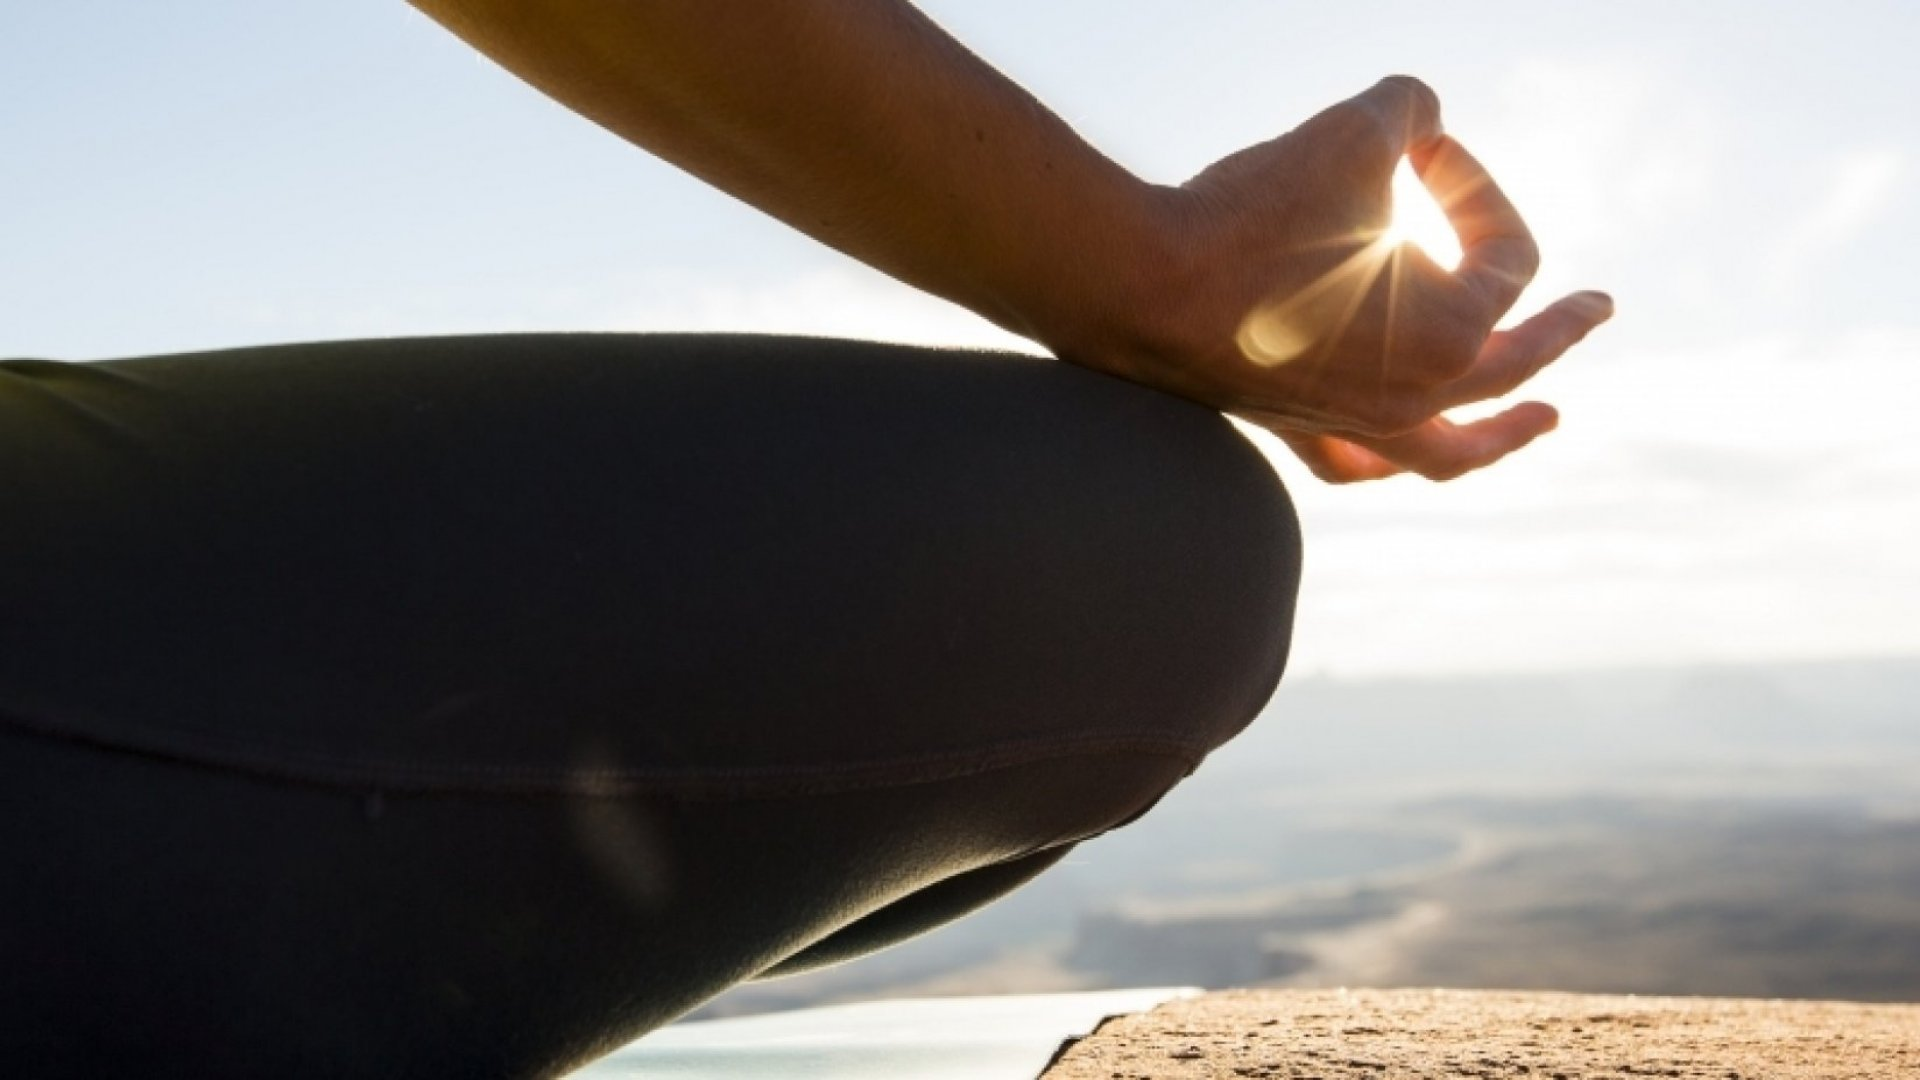 6 Incredibly Simple Ways to Awaken Your Inner Guru